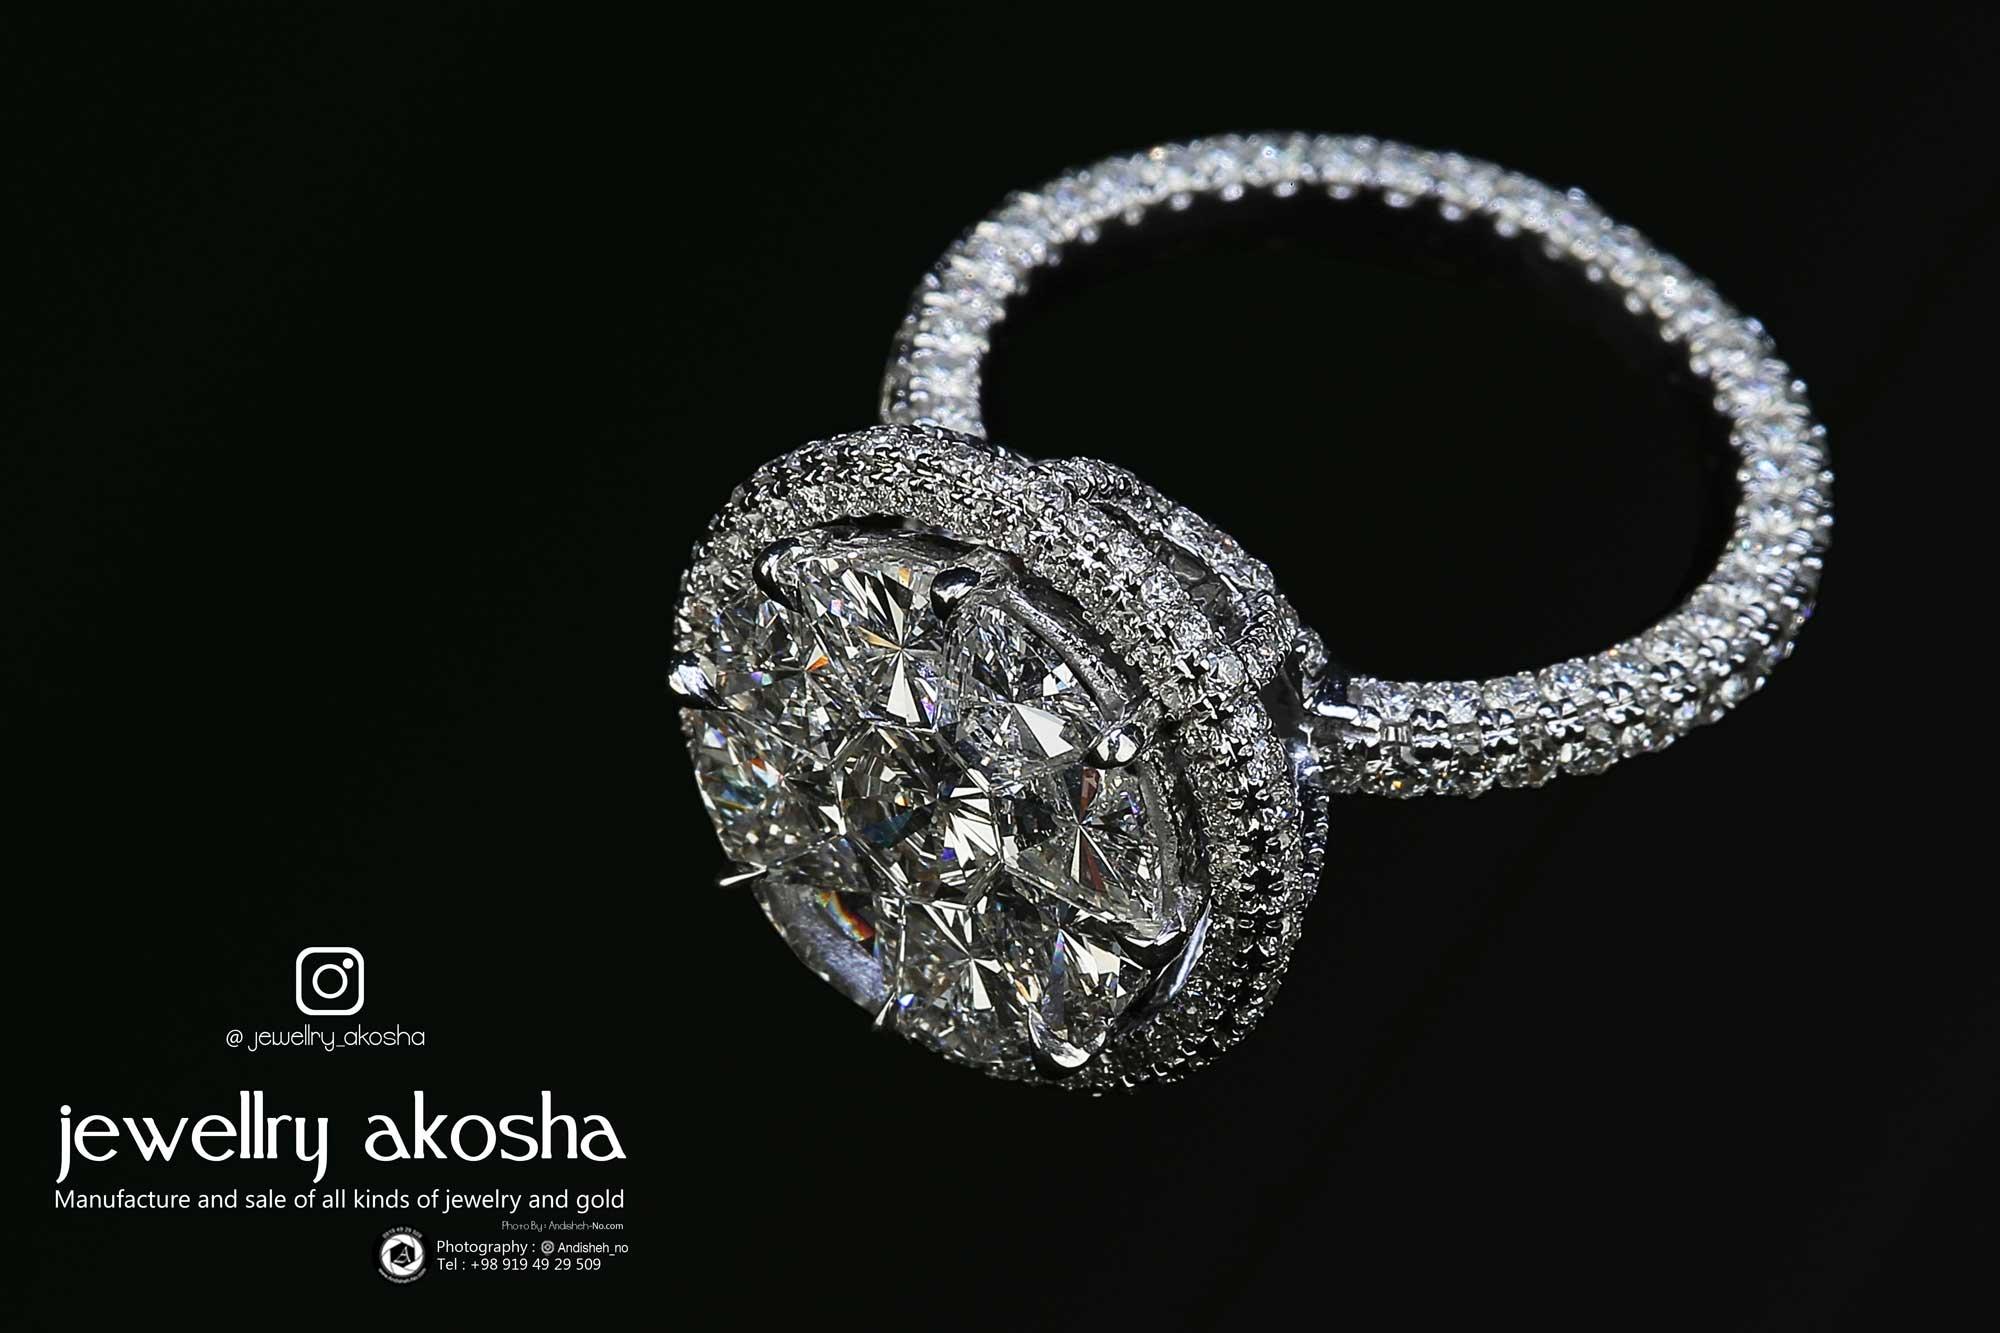 Industrial advertising photography studio for jewelry, jewelry and precious stones - ashoka - andisheh no - nima nasiri